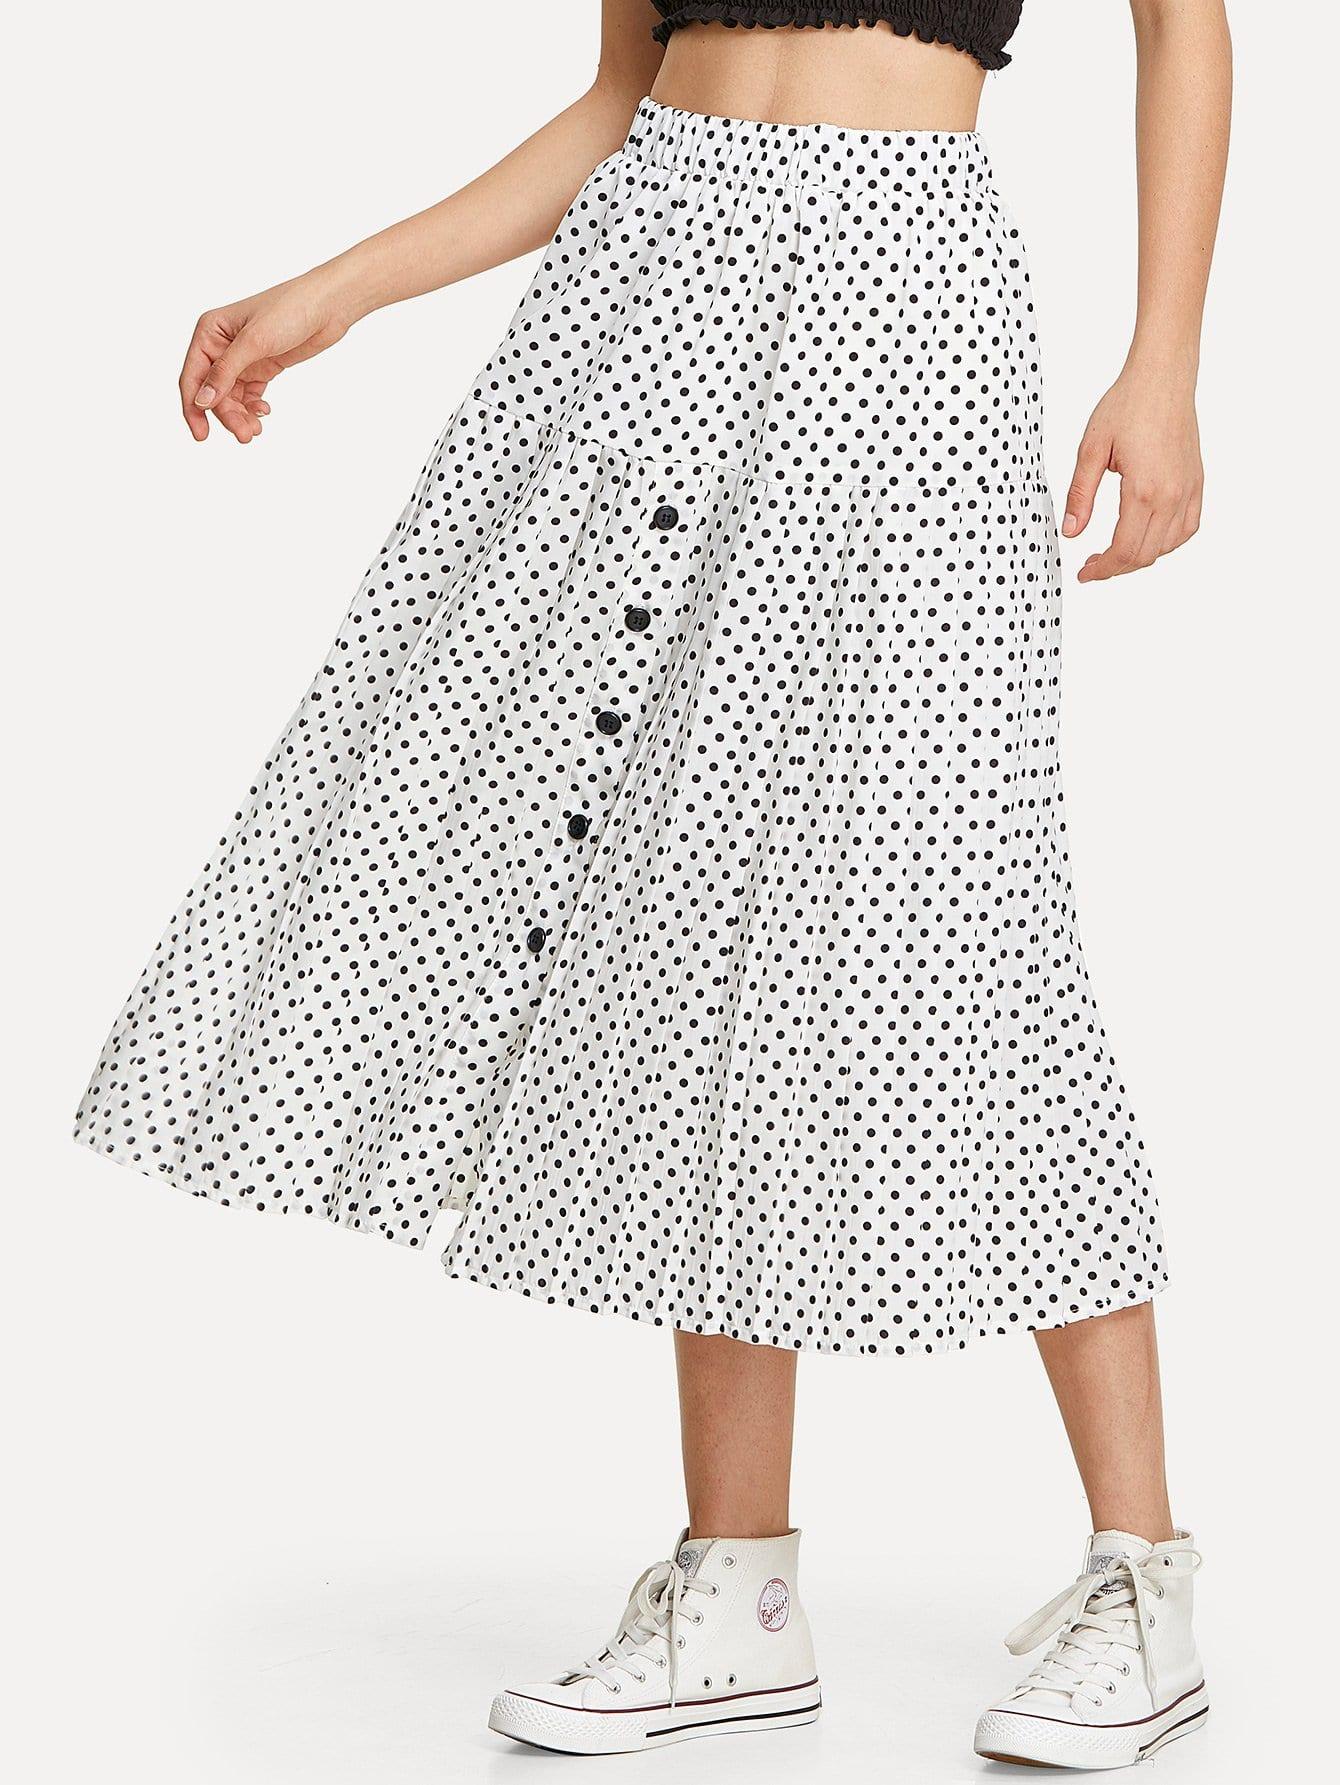 Single Breasted Polka Dot Pleated Skirt single breasted polka dot pleated skirt